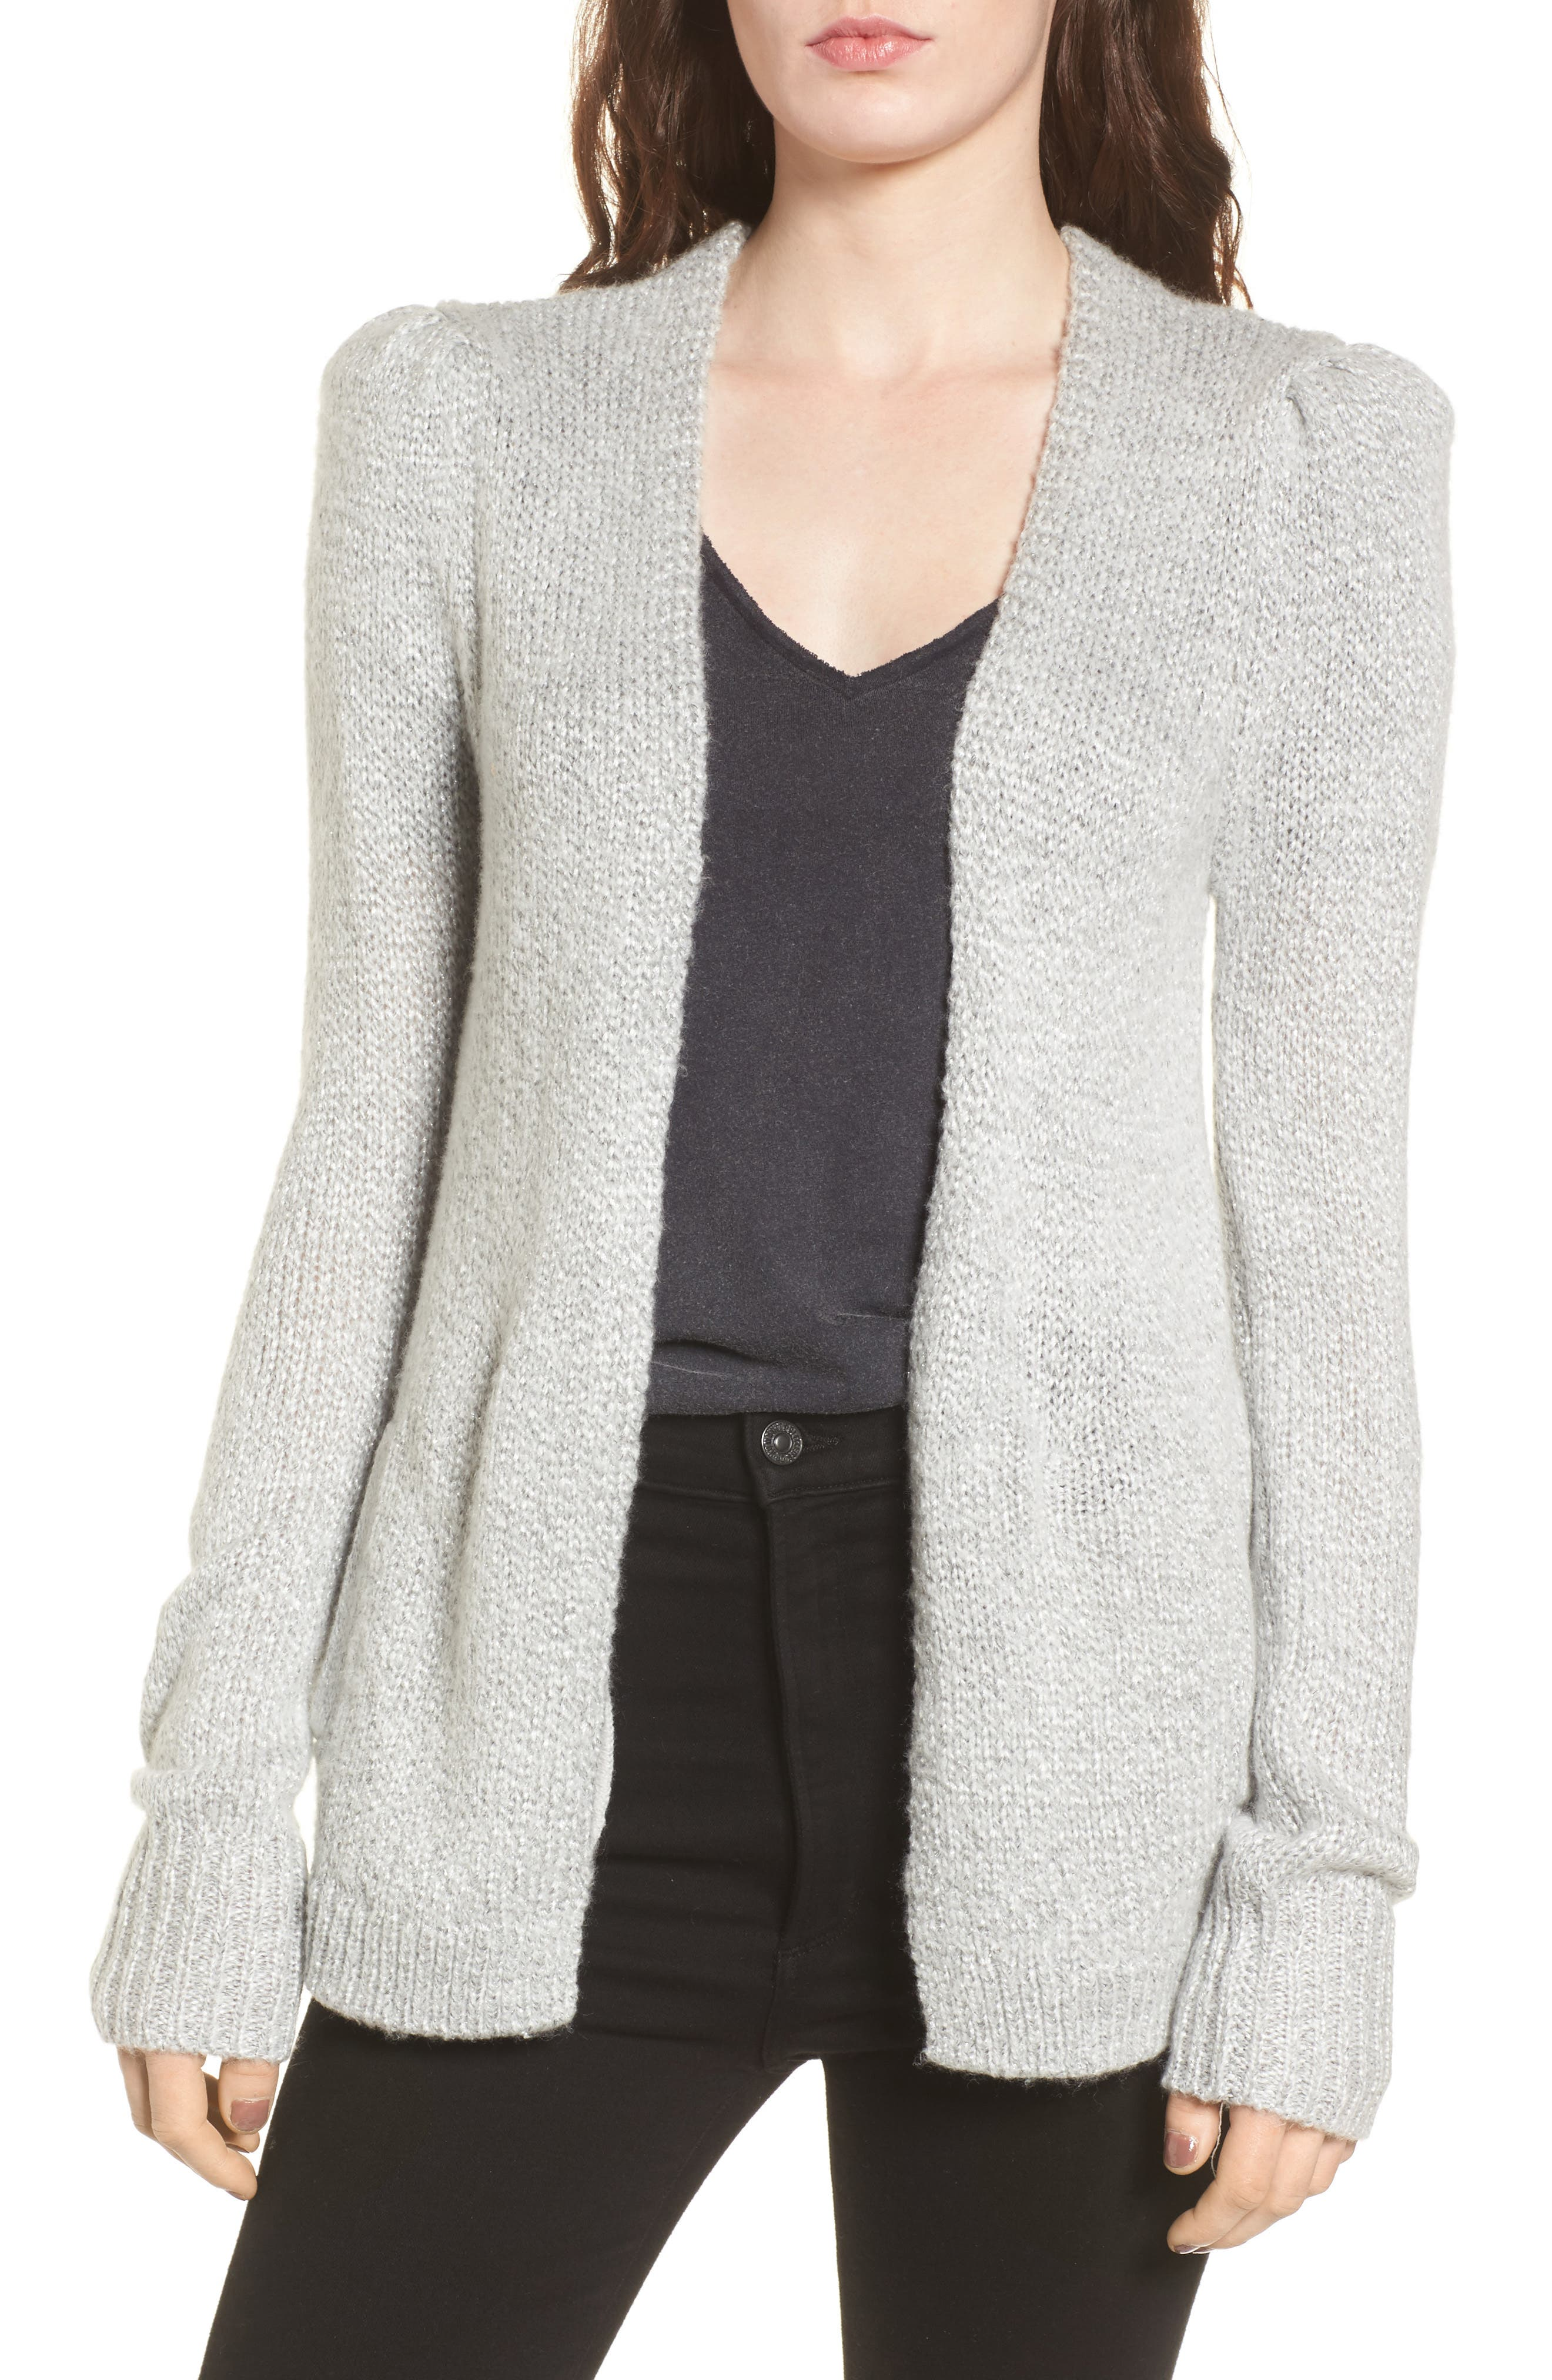 Shine Cardigan Sweater,                             Main thumbnail 1, color,                             020